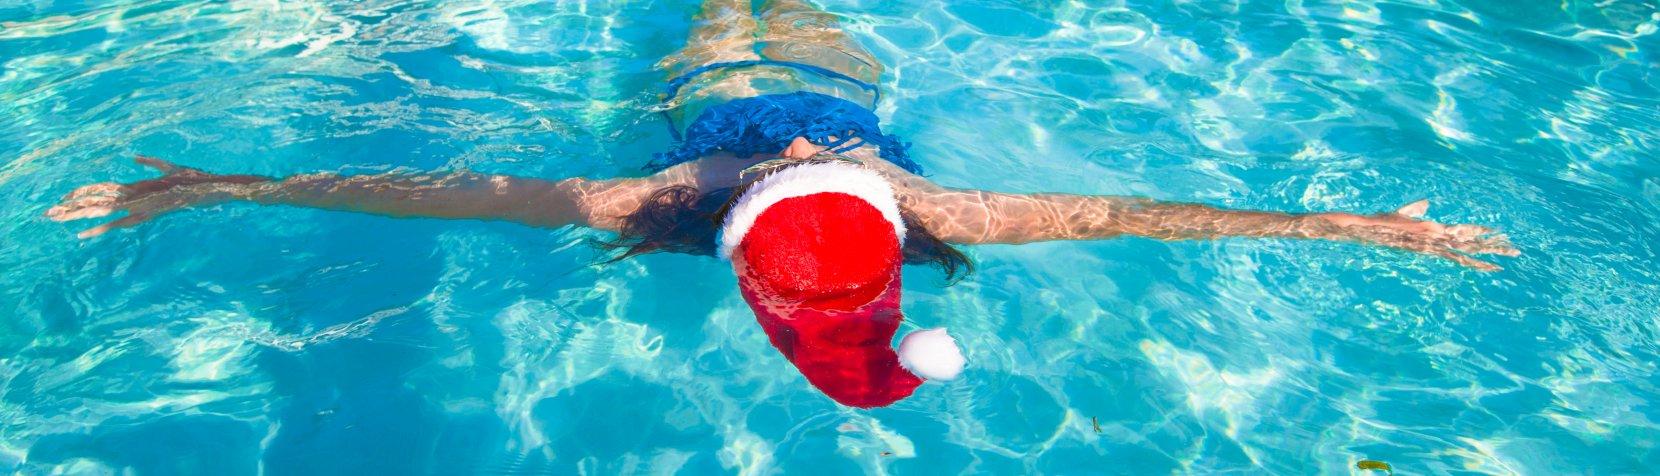 foto: Jul i svømmehallen